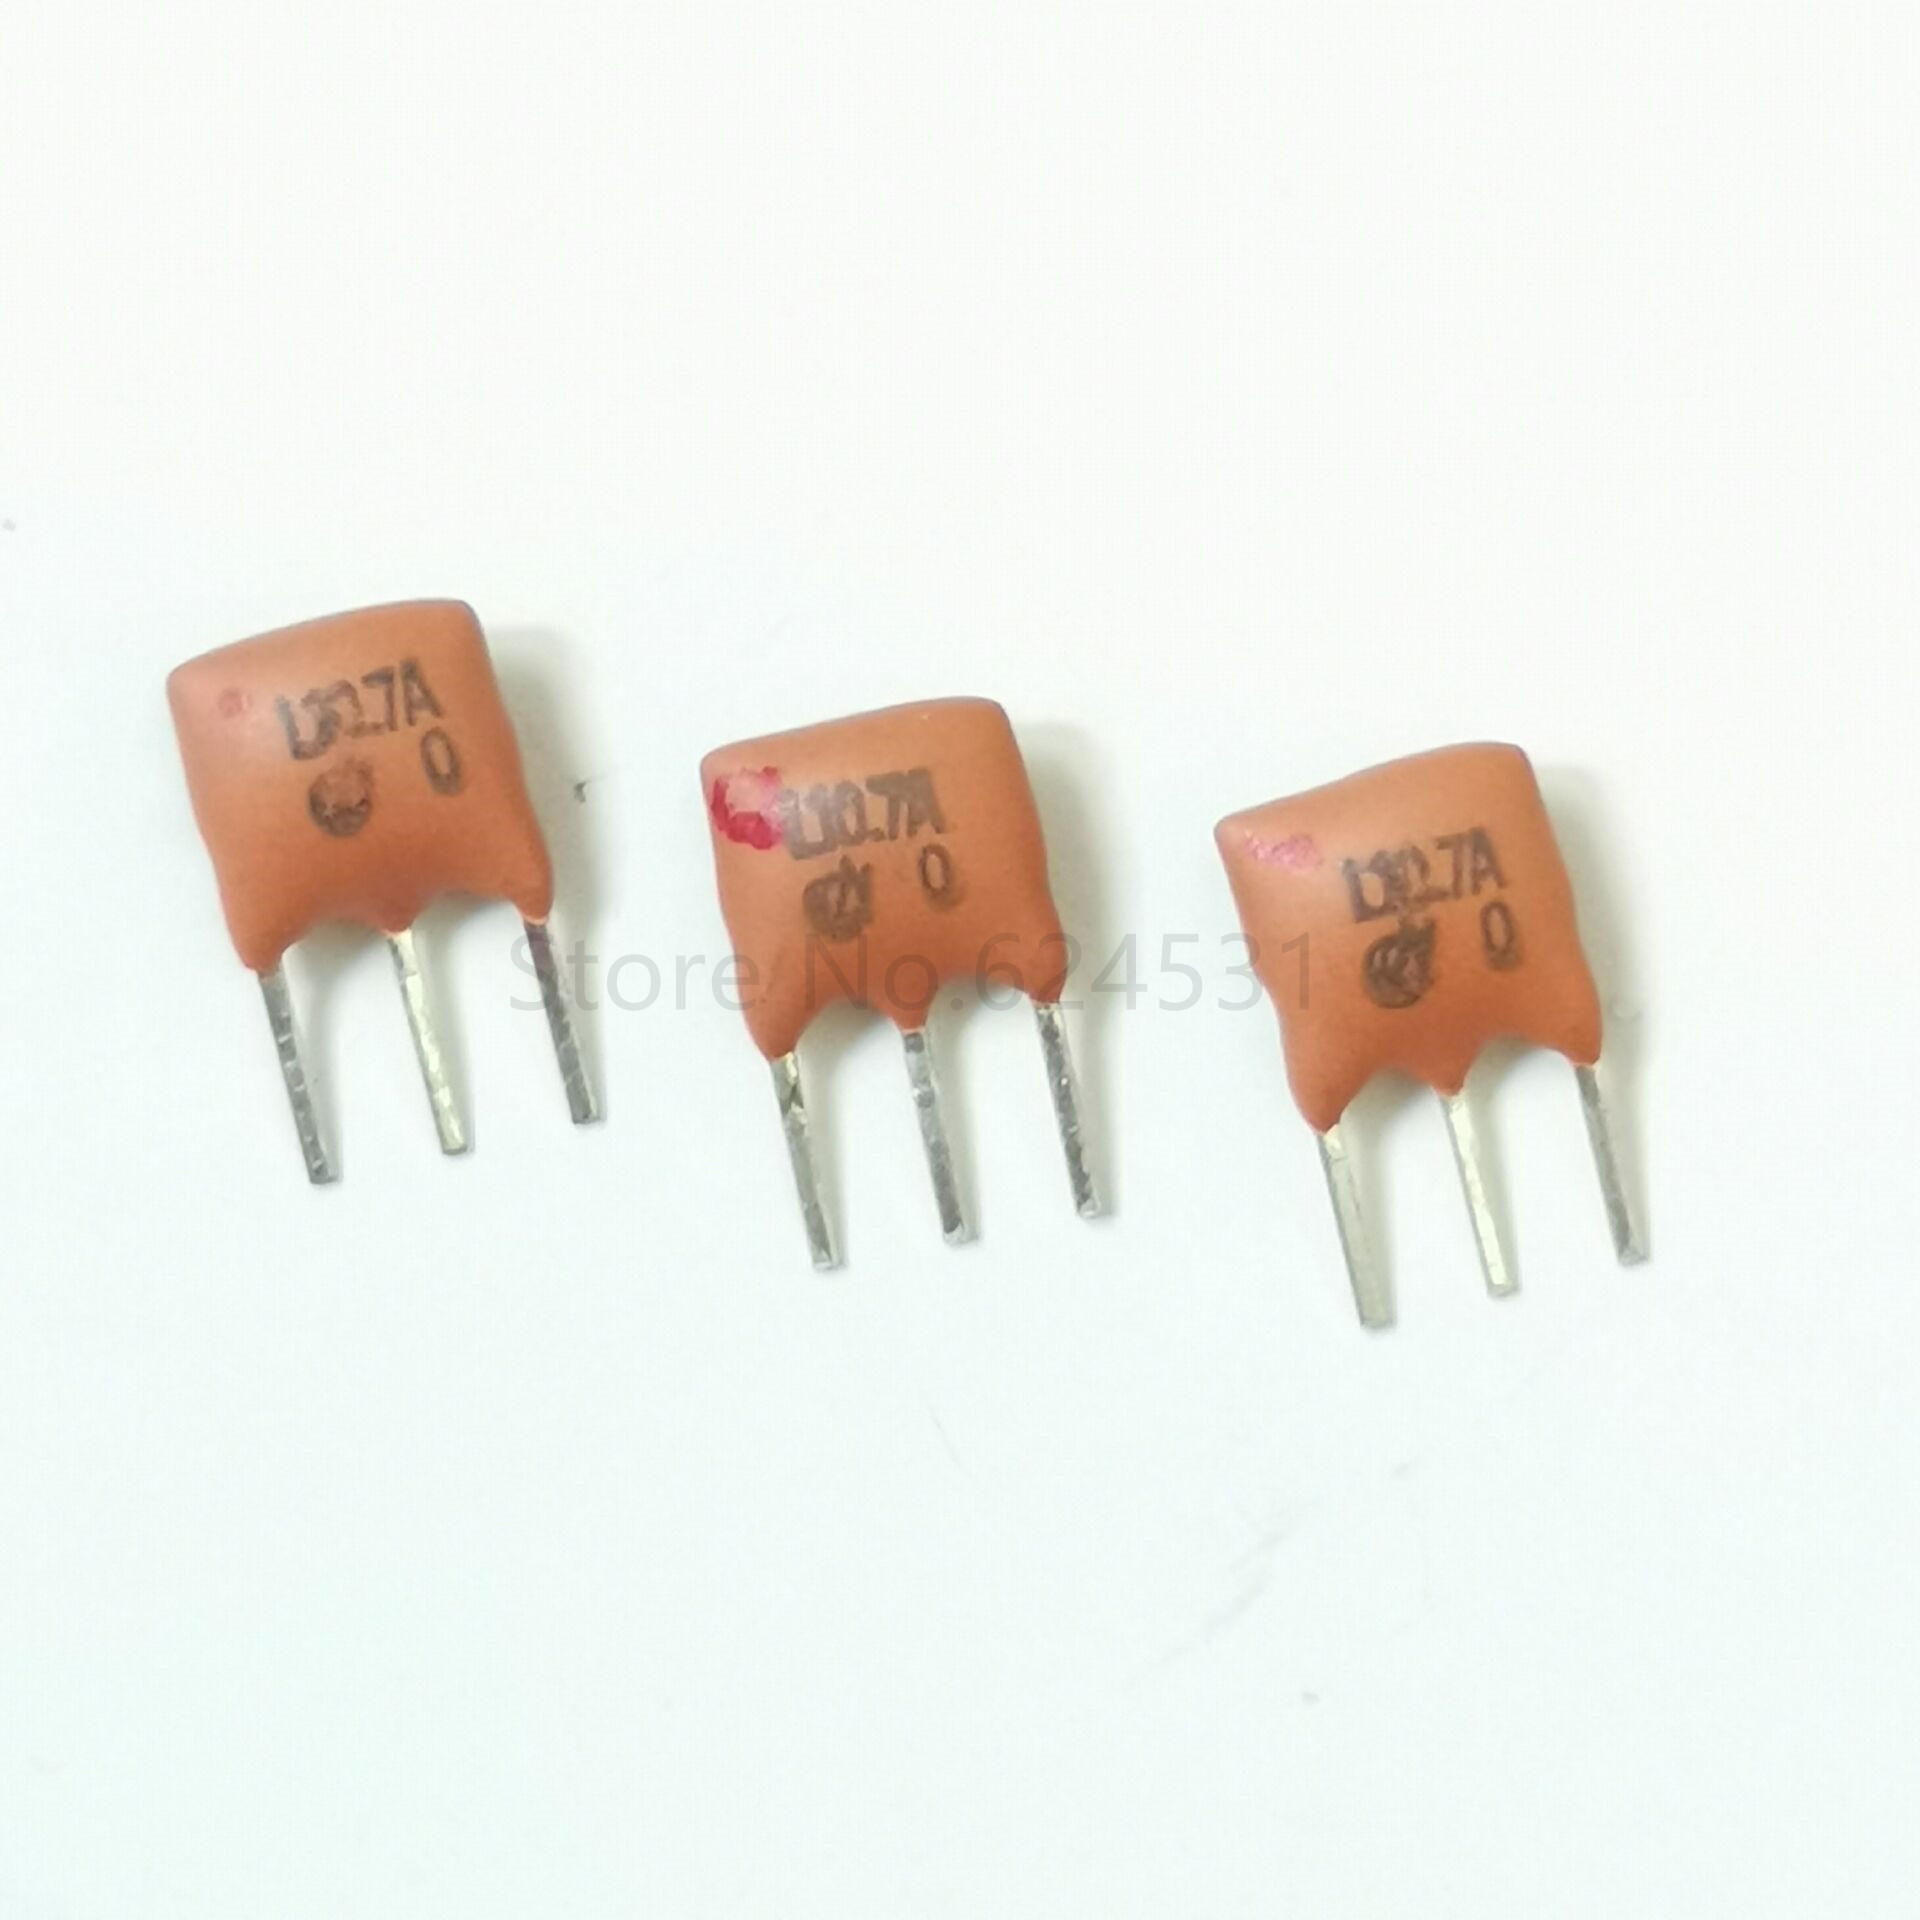 10pcs Ceramic Crystal Oscillator 10.700MHZ 10.7M ZTT10.7M LF10.7M Inline 3 Feet